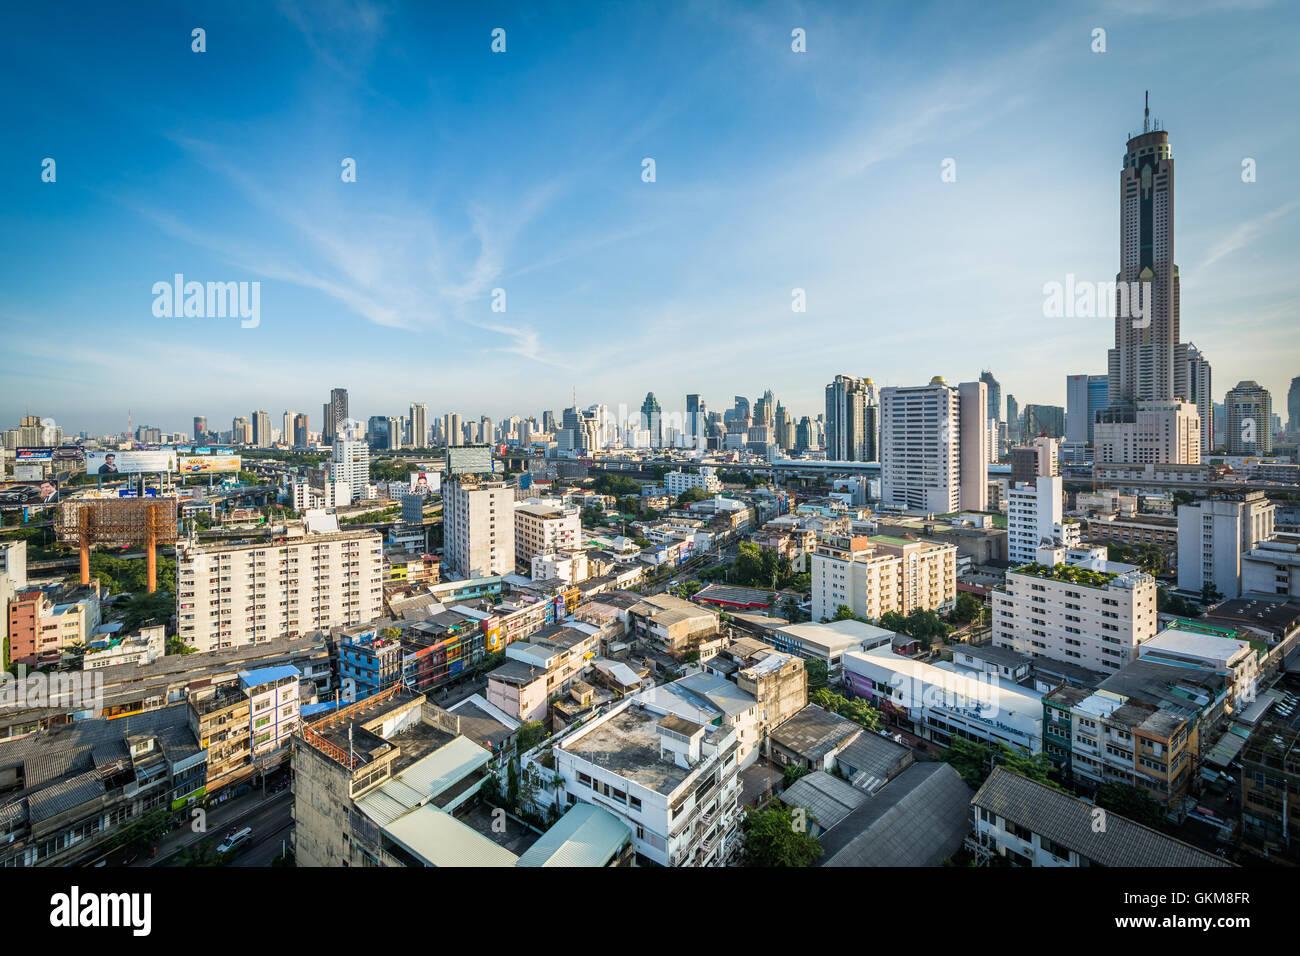 Vista del quartiere Ratchathewi, a Bangkok, in Thailandia. Immagini Stock